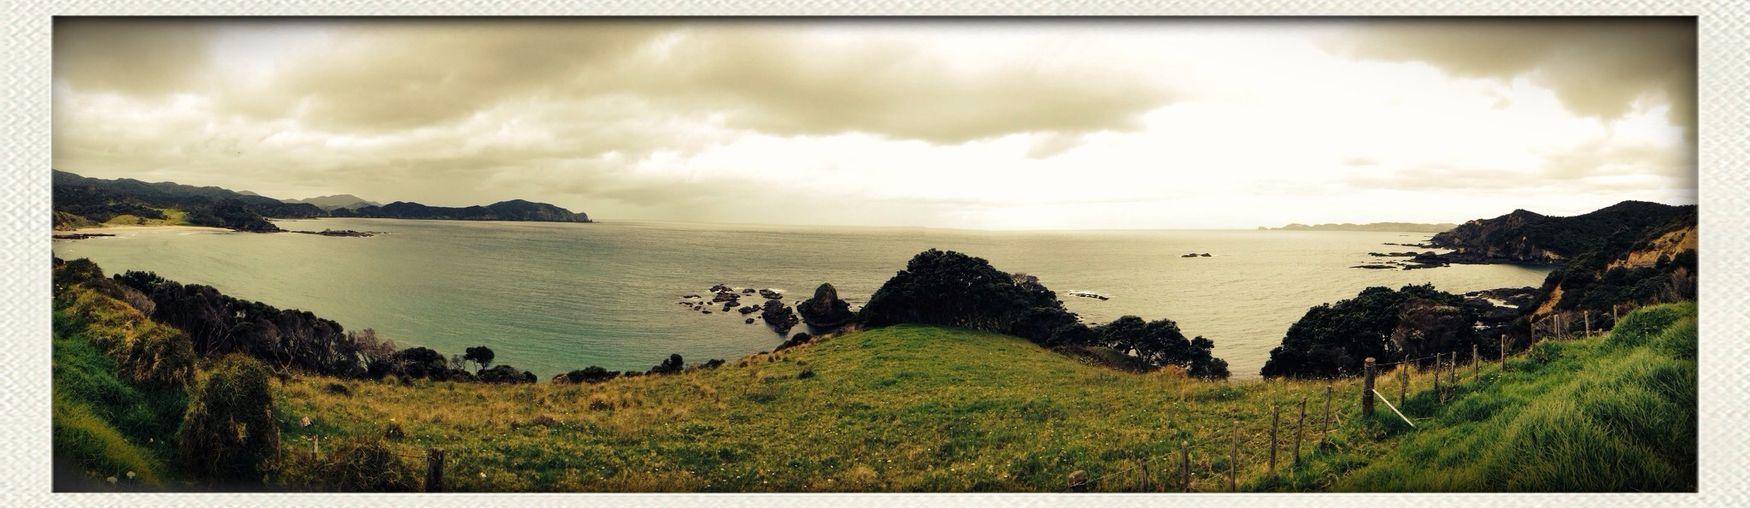 Bay of Islands! Newzealand